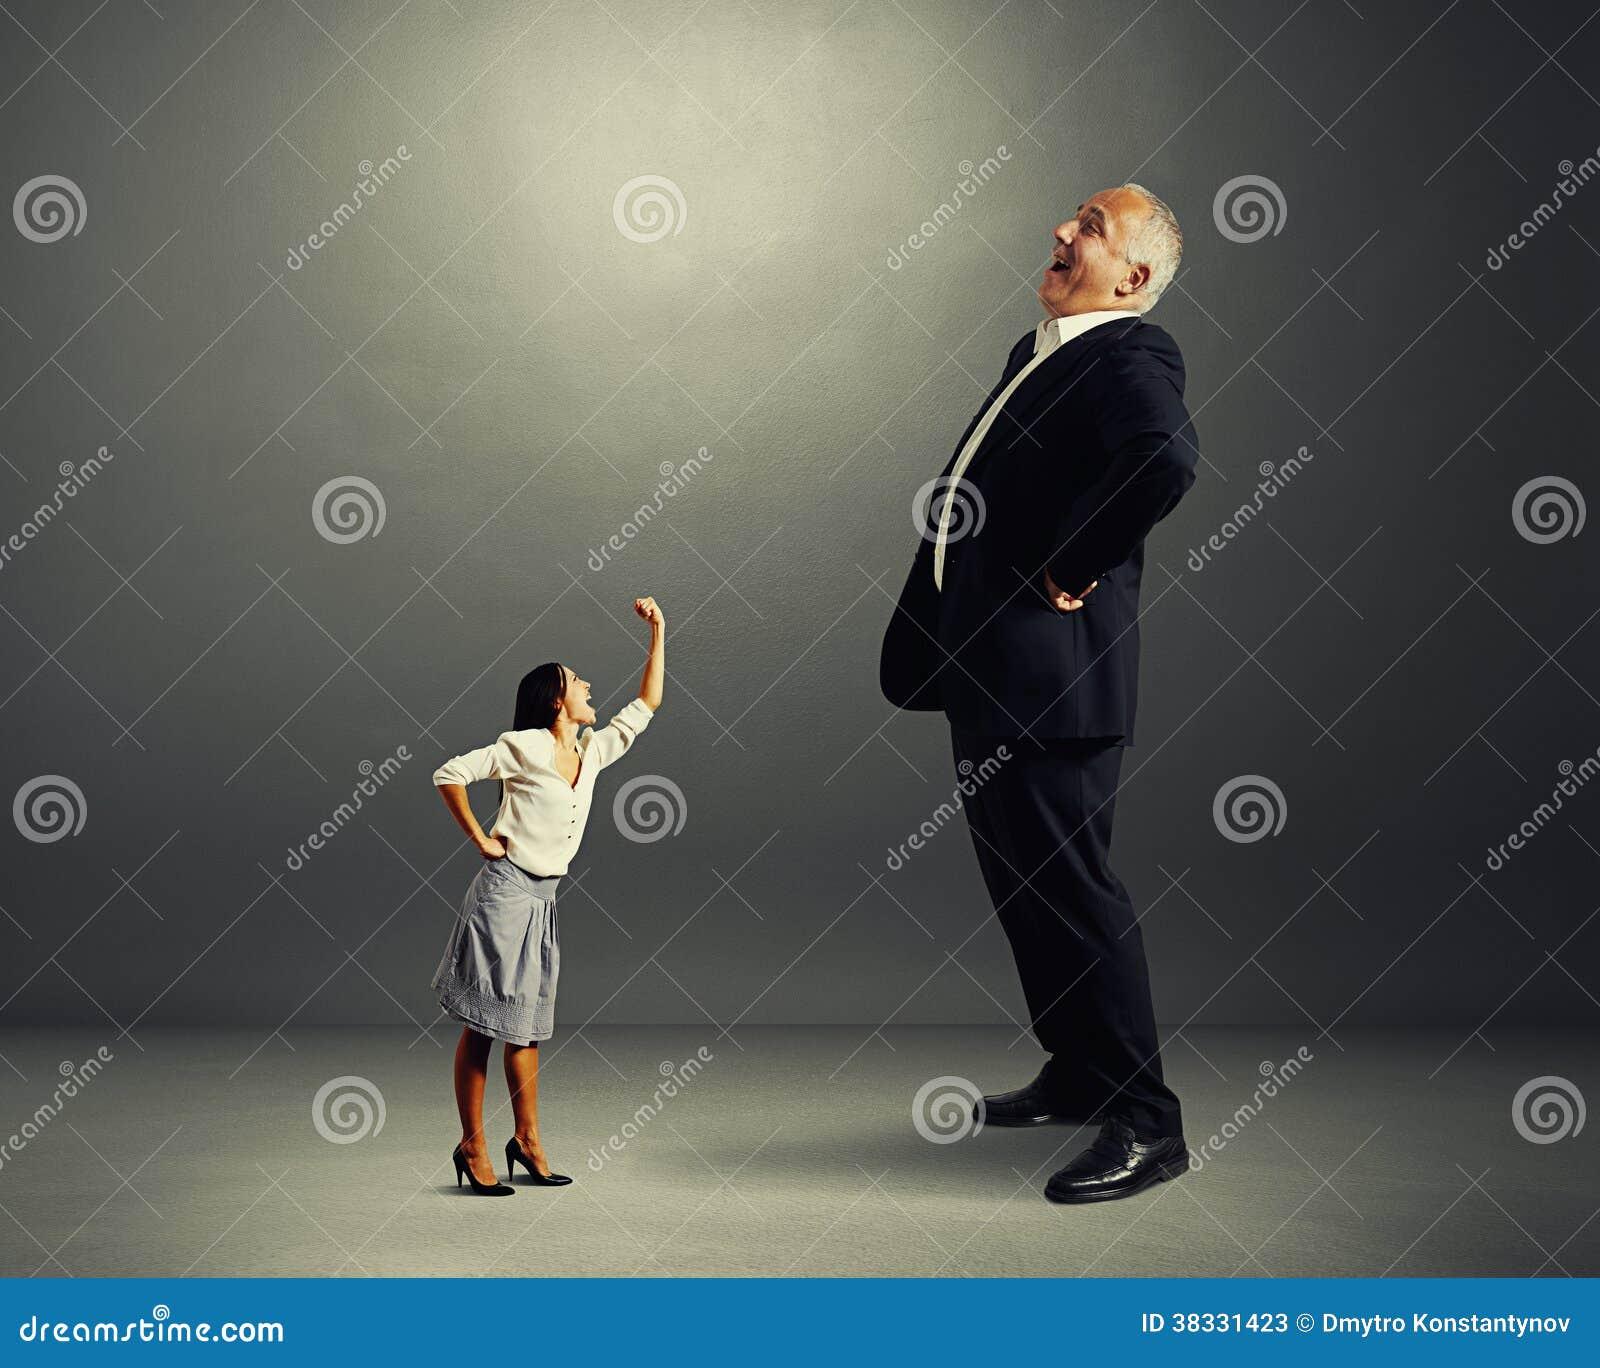 Woman Screaming At Big Laughing Businessman Stock Image Image Of